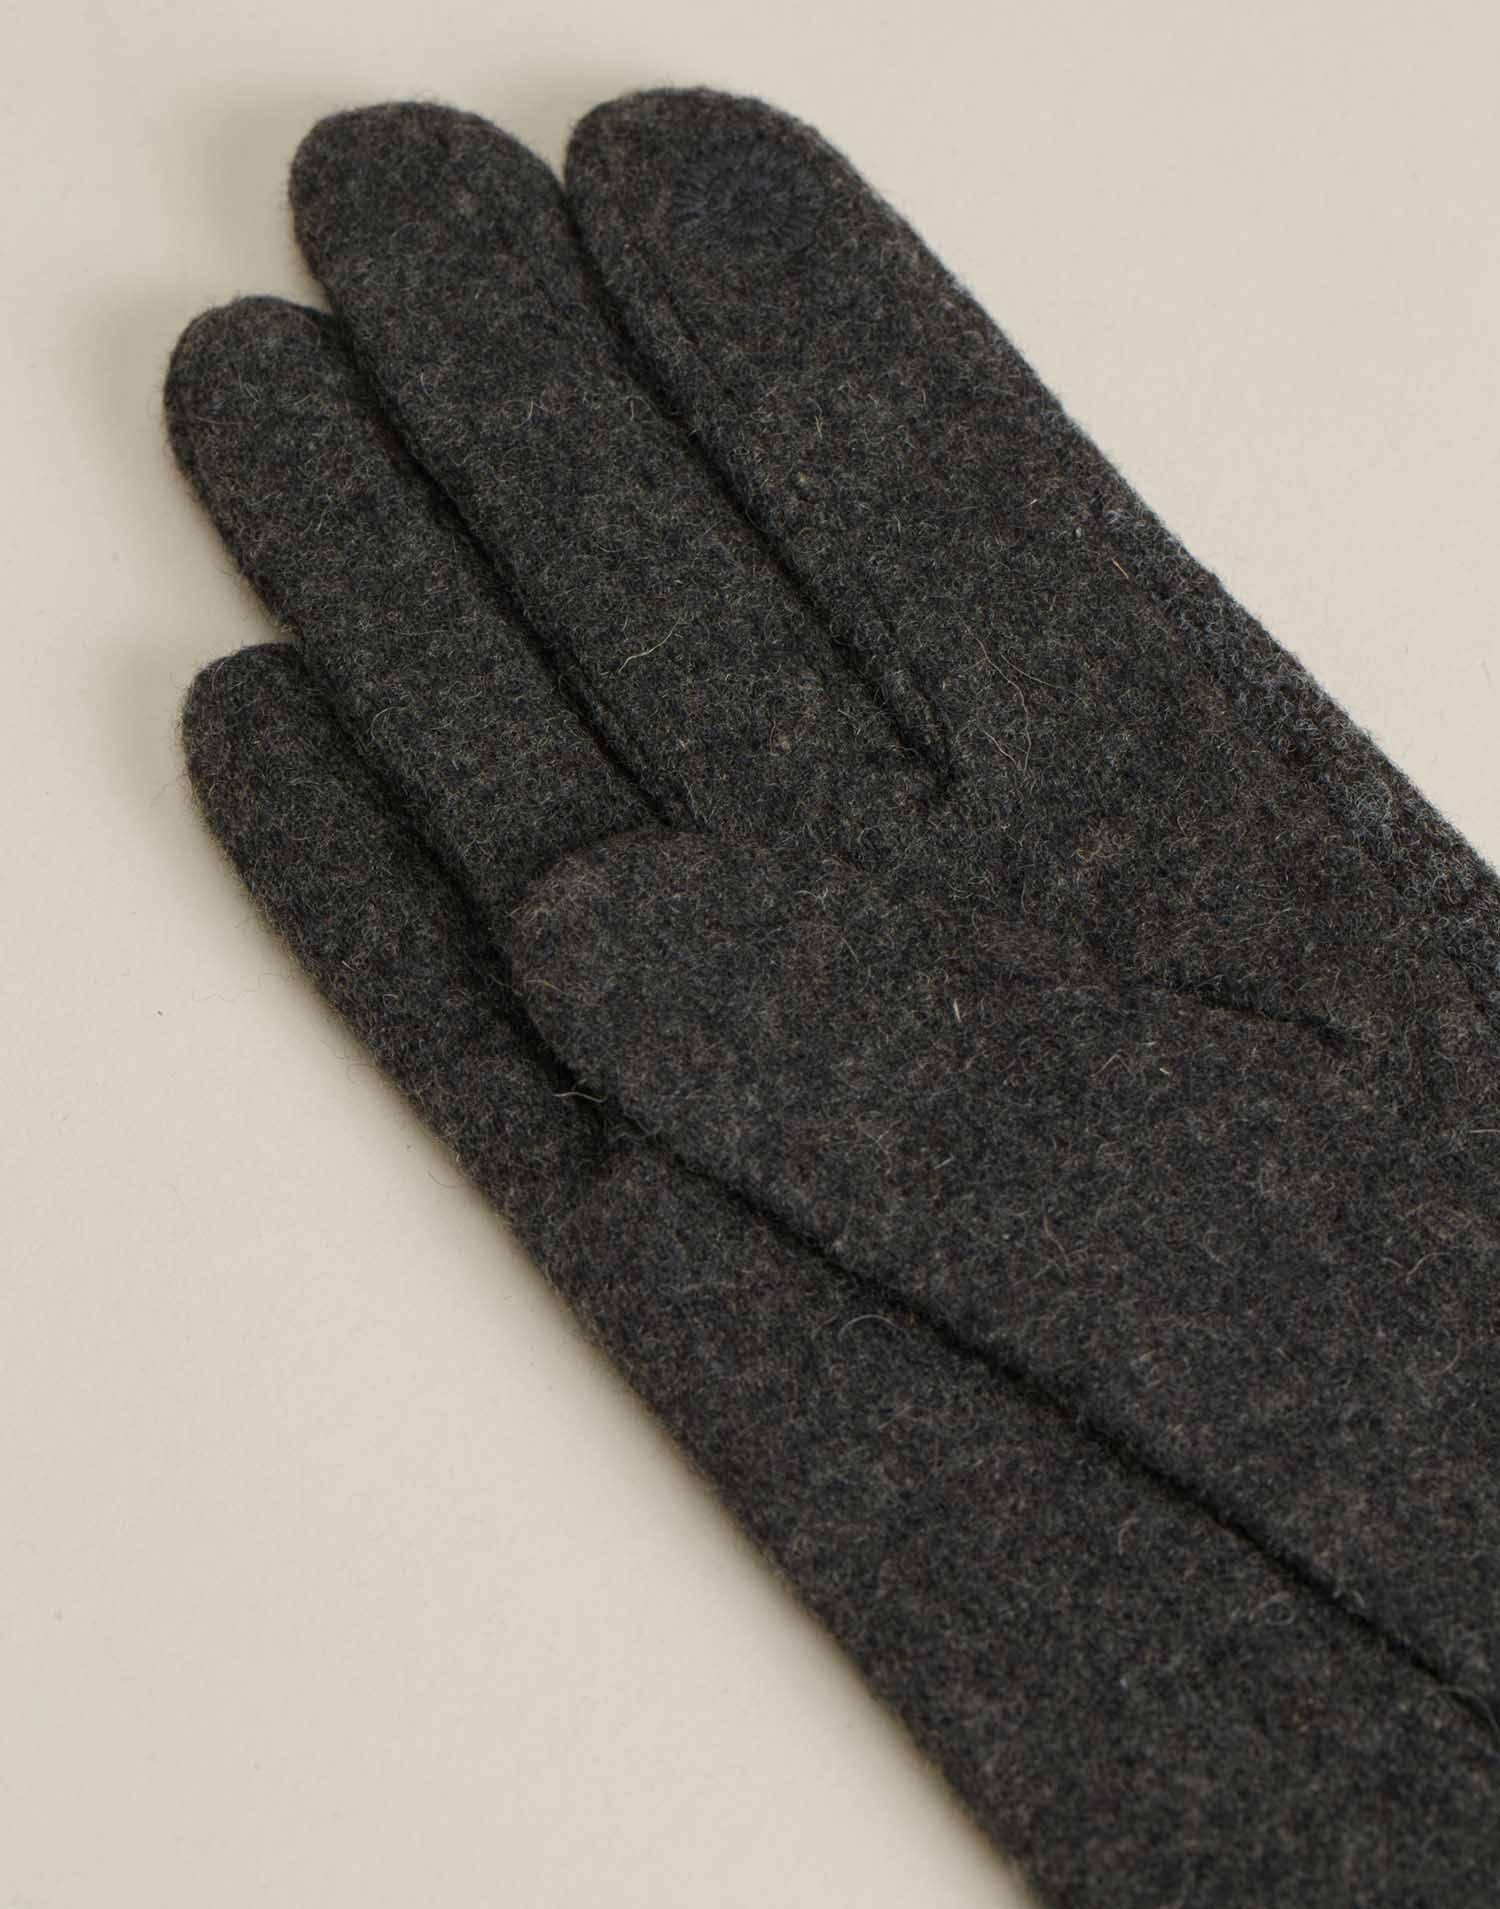 Wool and jersey tech glove